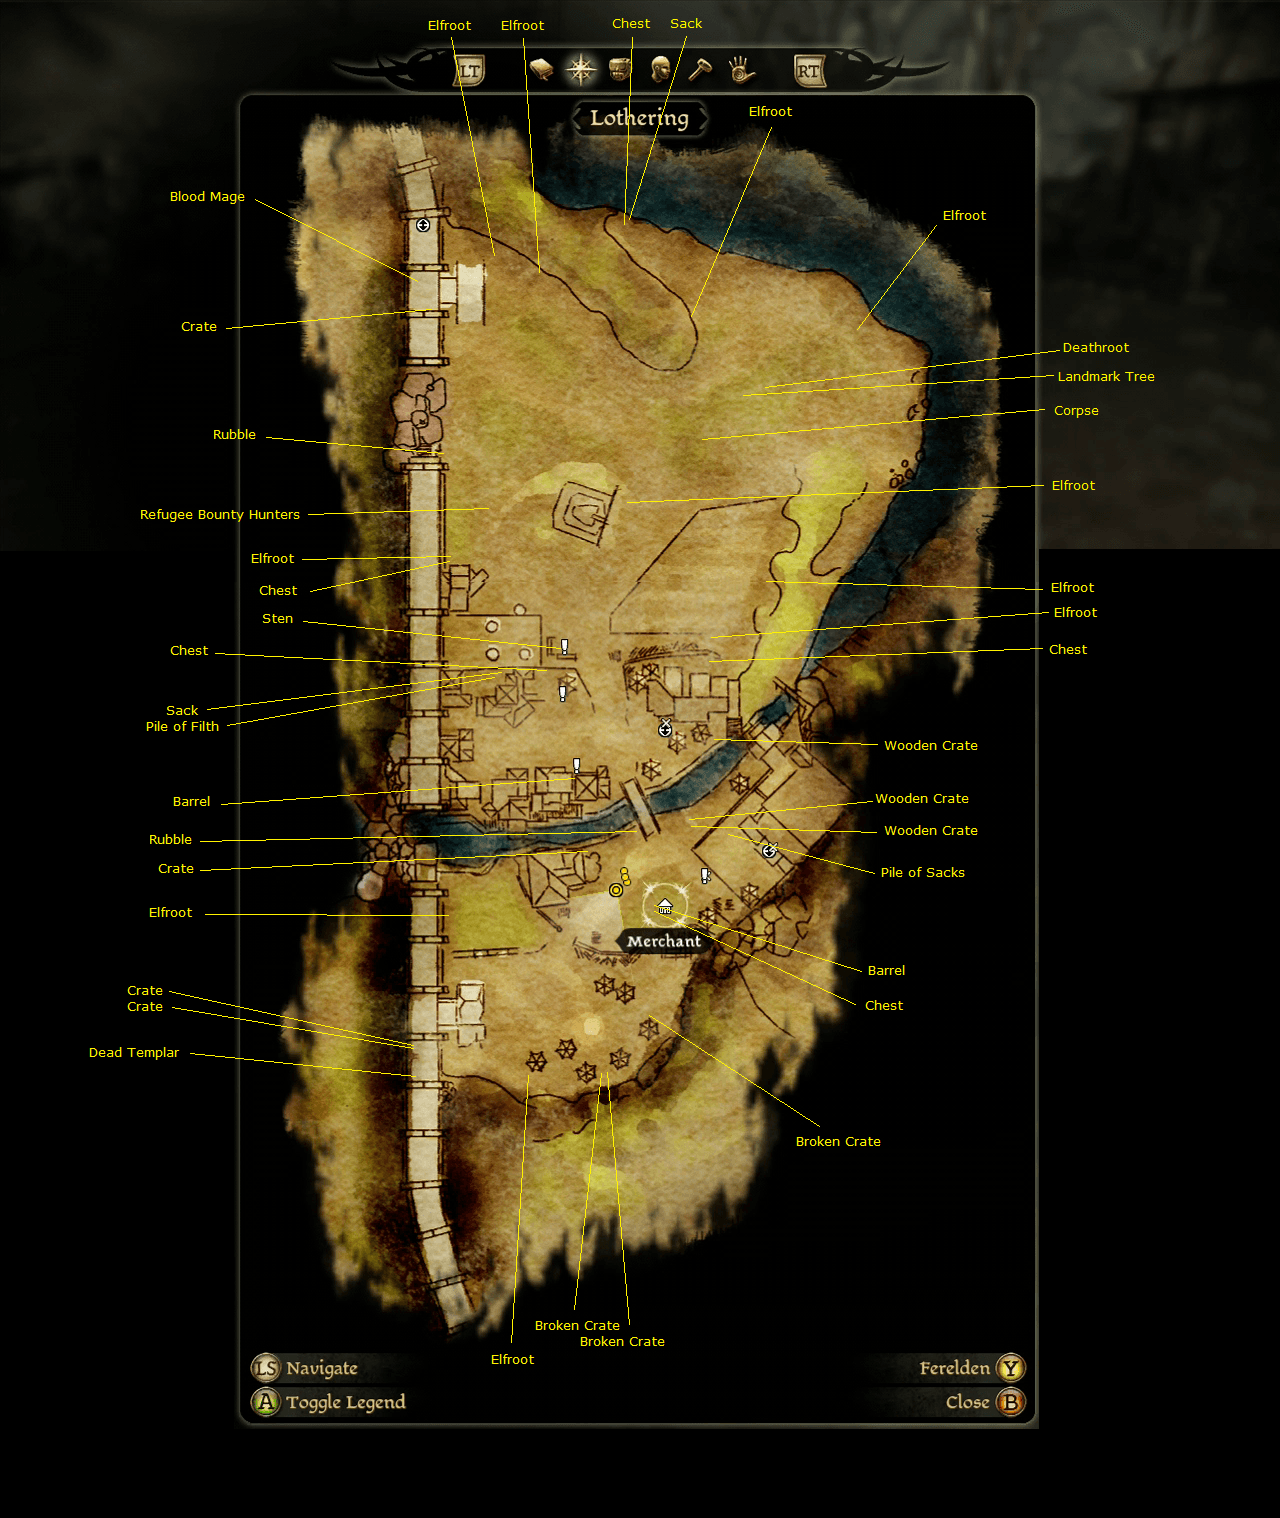 Dragon Age: Origins Walkthrough - Page 11